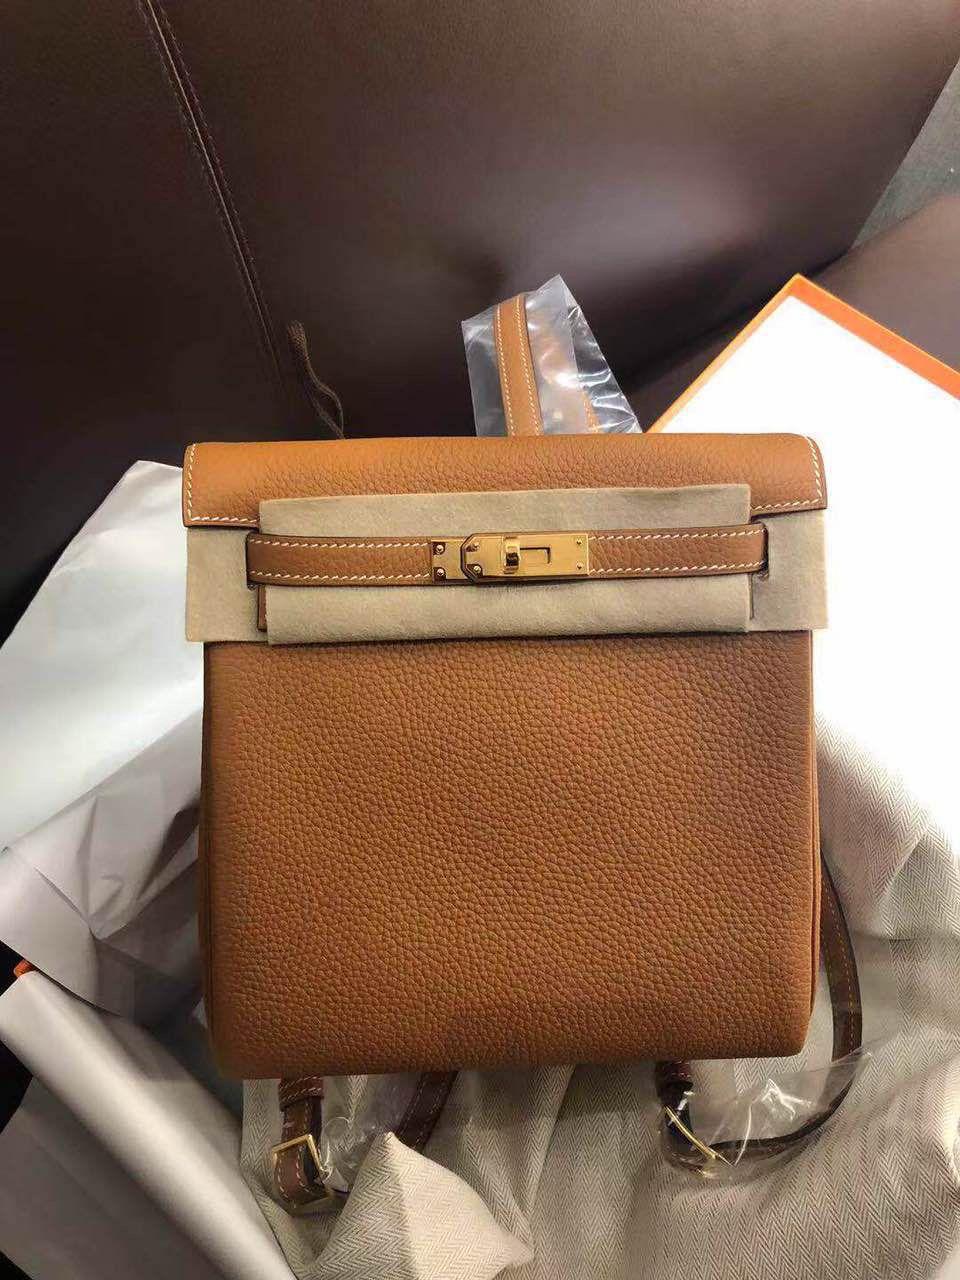 d6cb0db13f93 Hermès kellyado backpack Togo leather